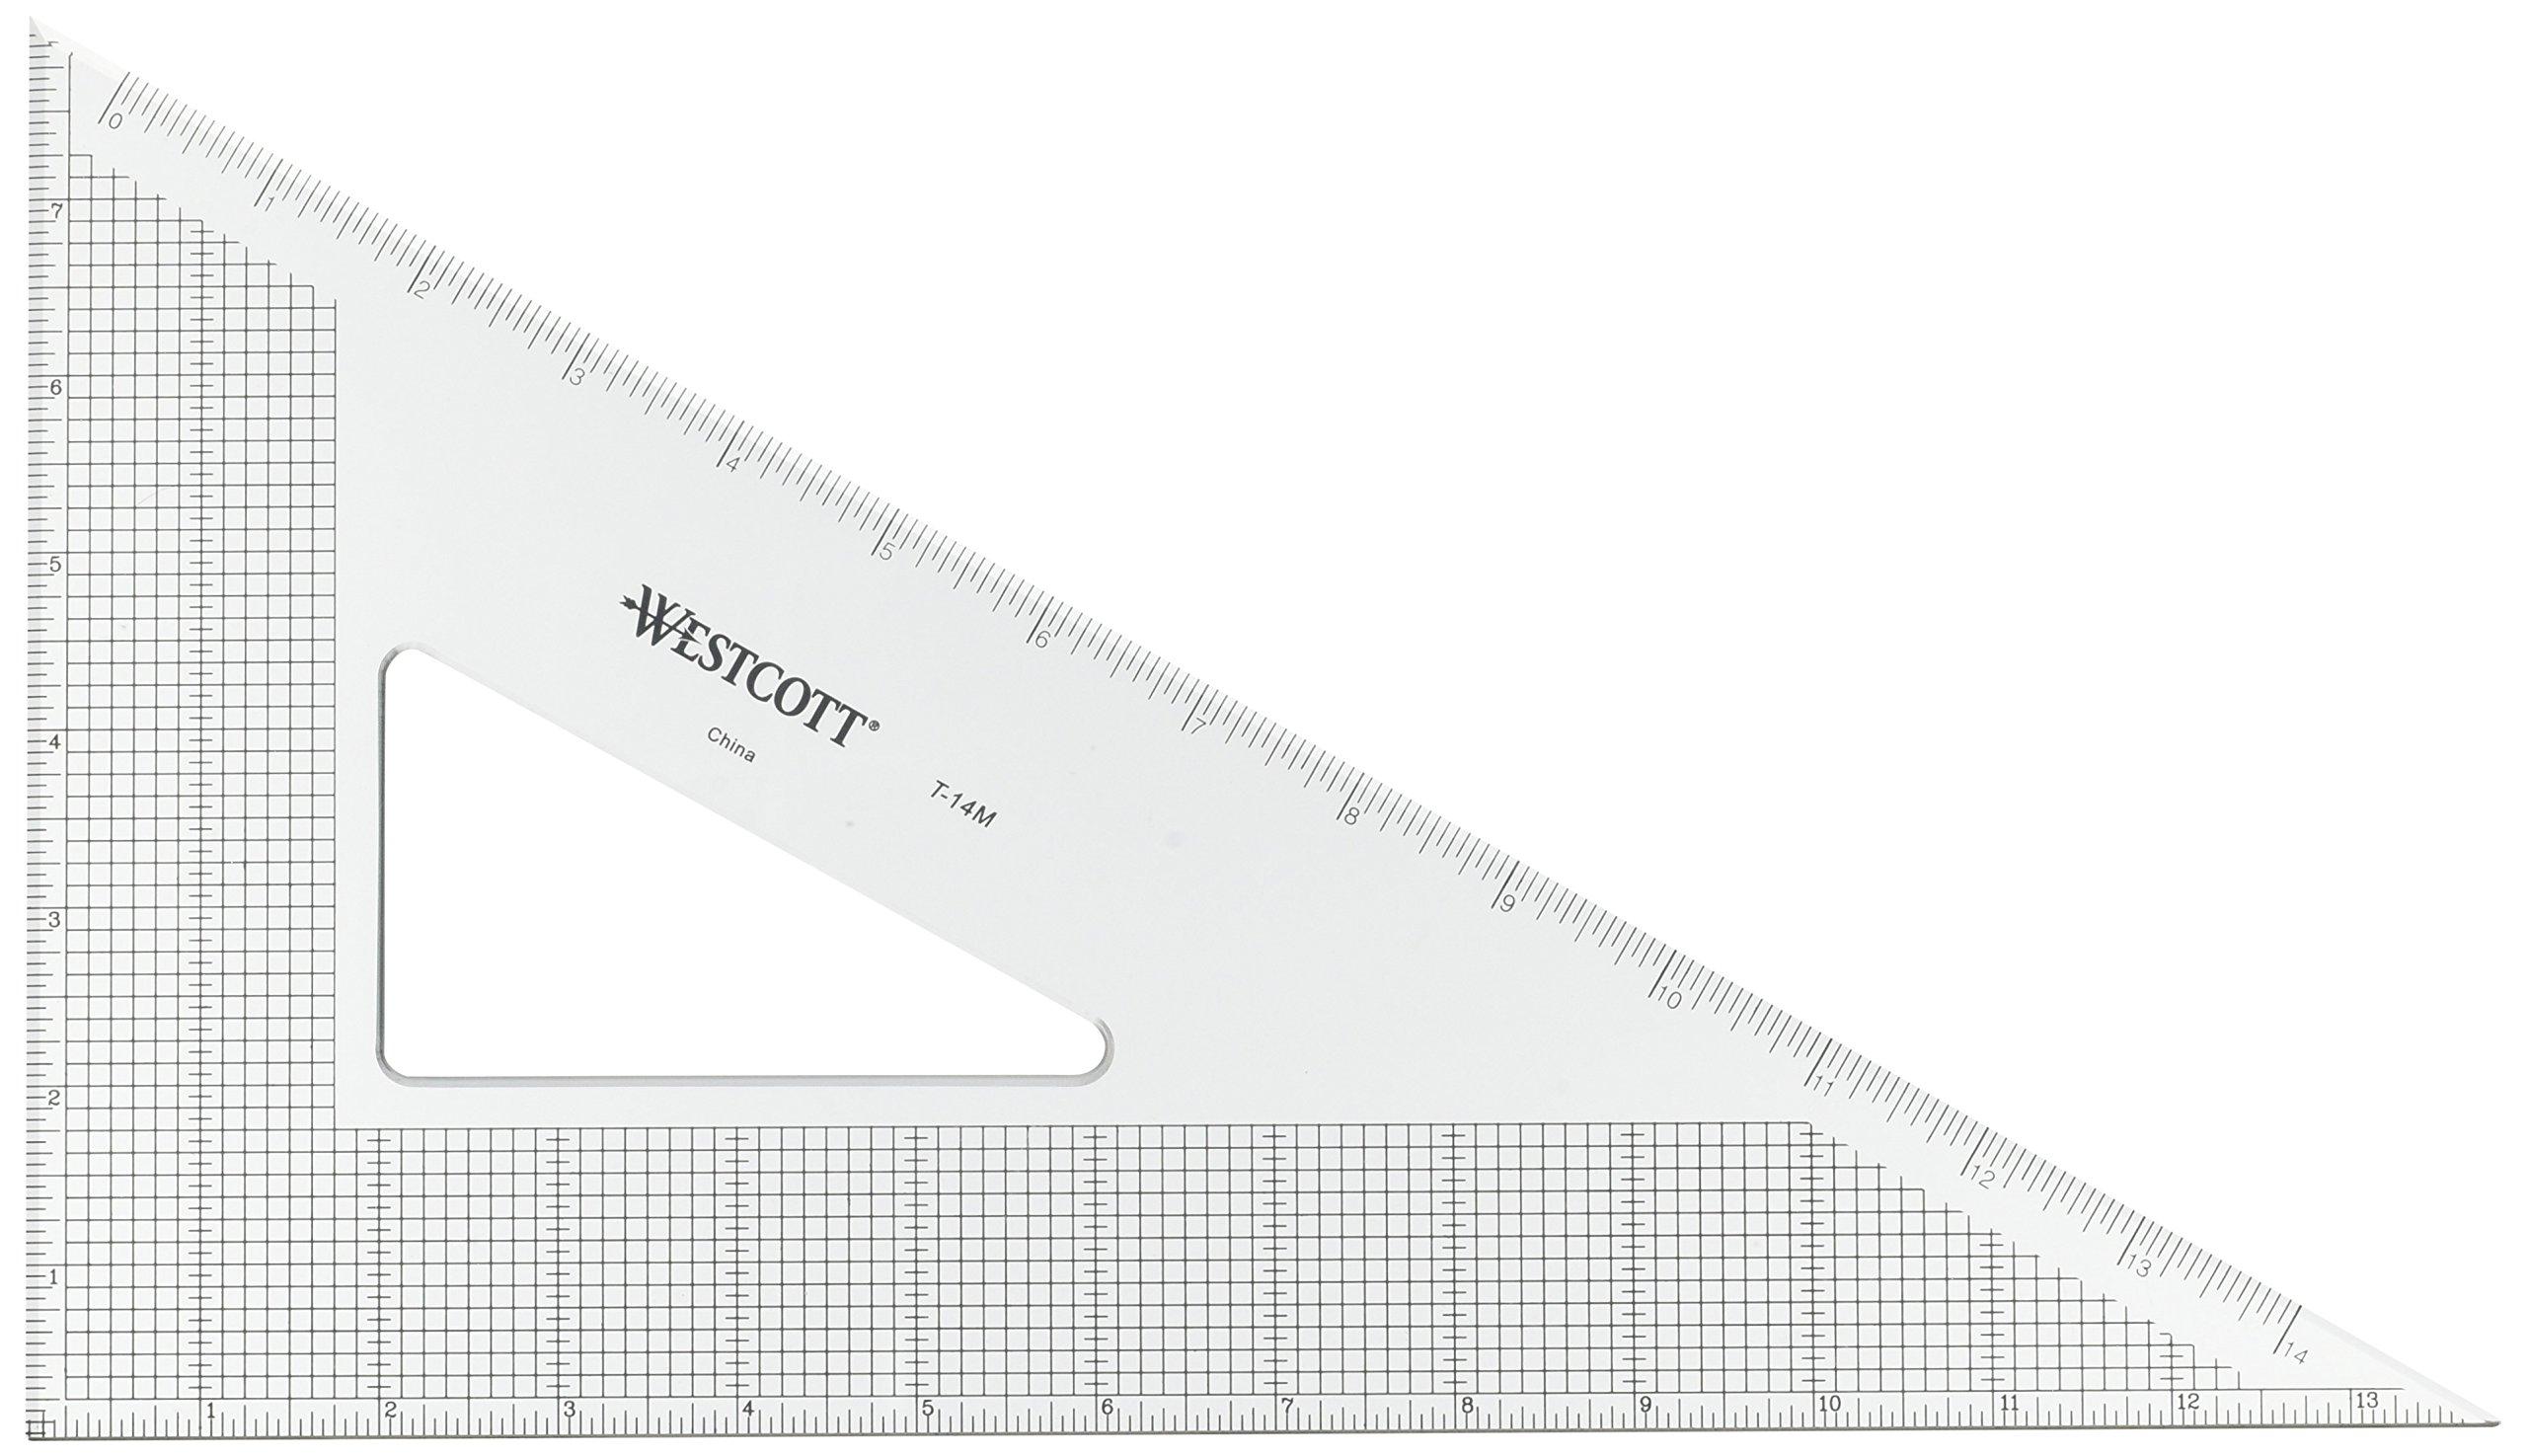 Westcott Grid Triangle, 14'', 30/60 Degree, Transparent (T-14M)